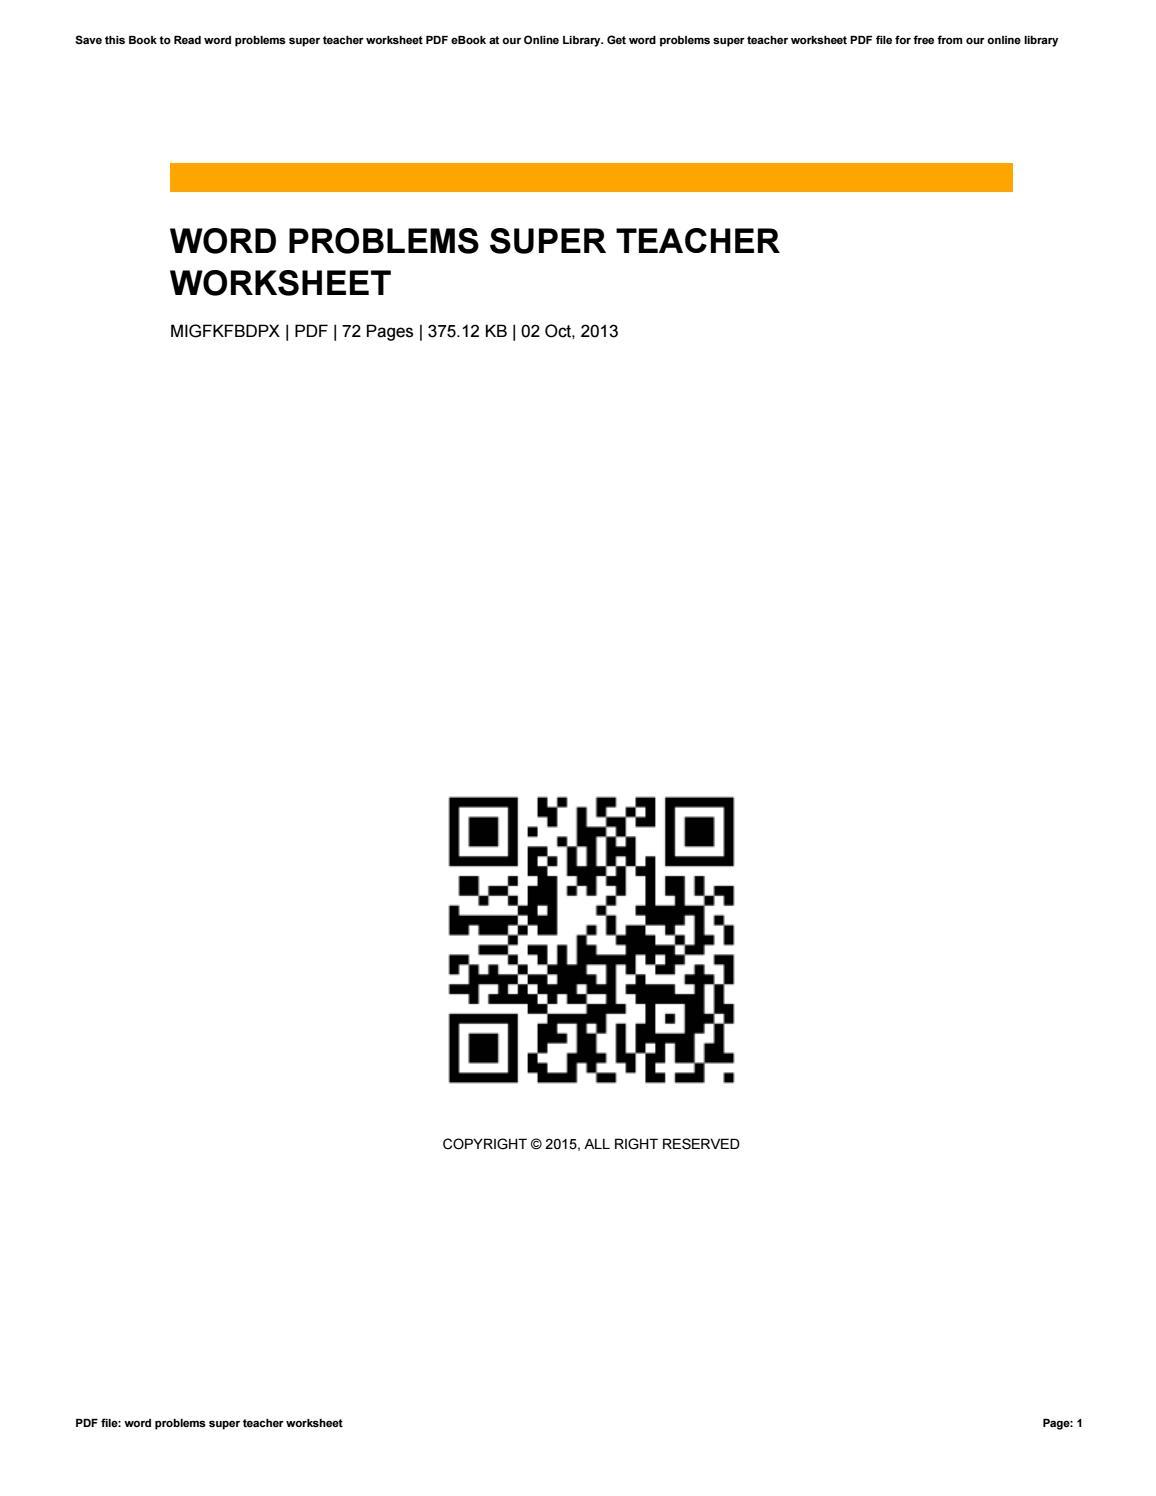 Word problems super teacher worksheet by RobThornburg4991 - issuu